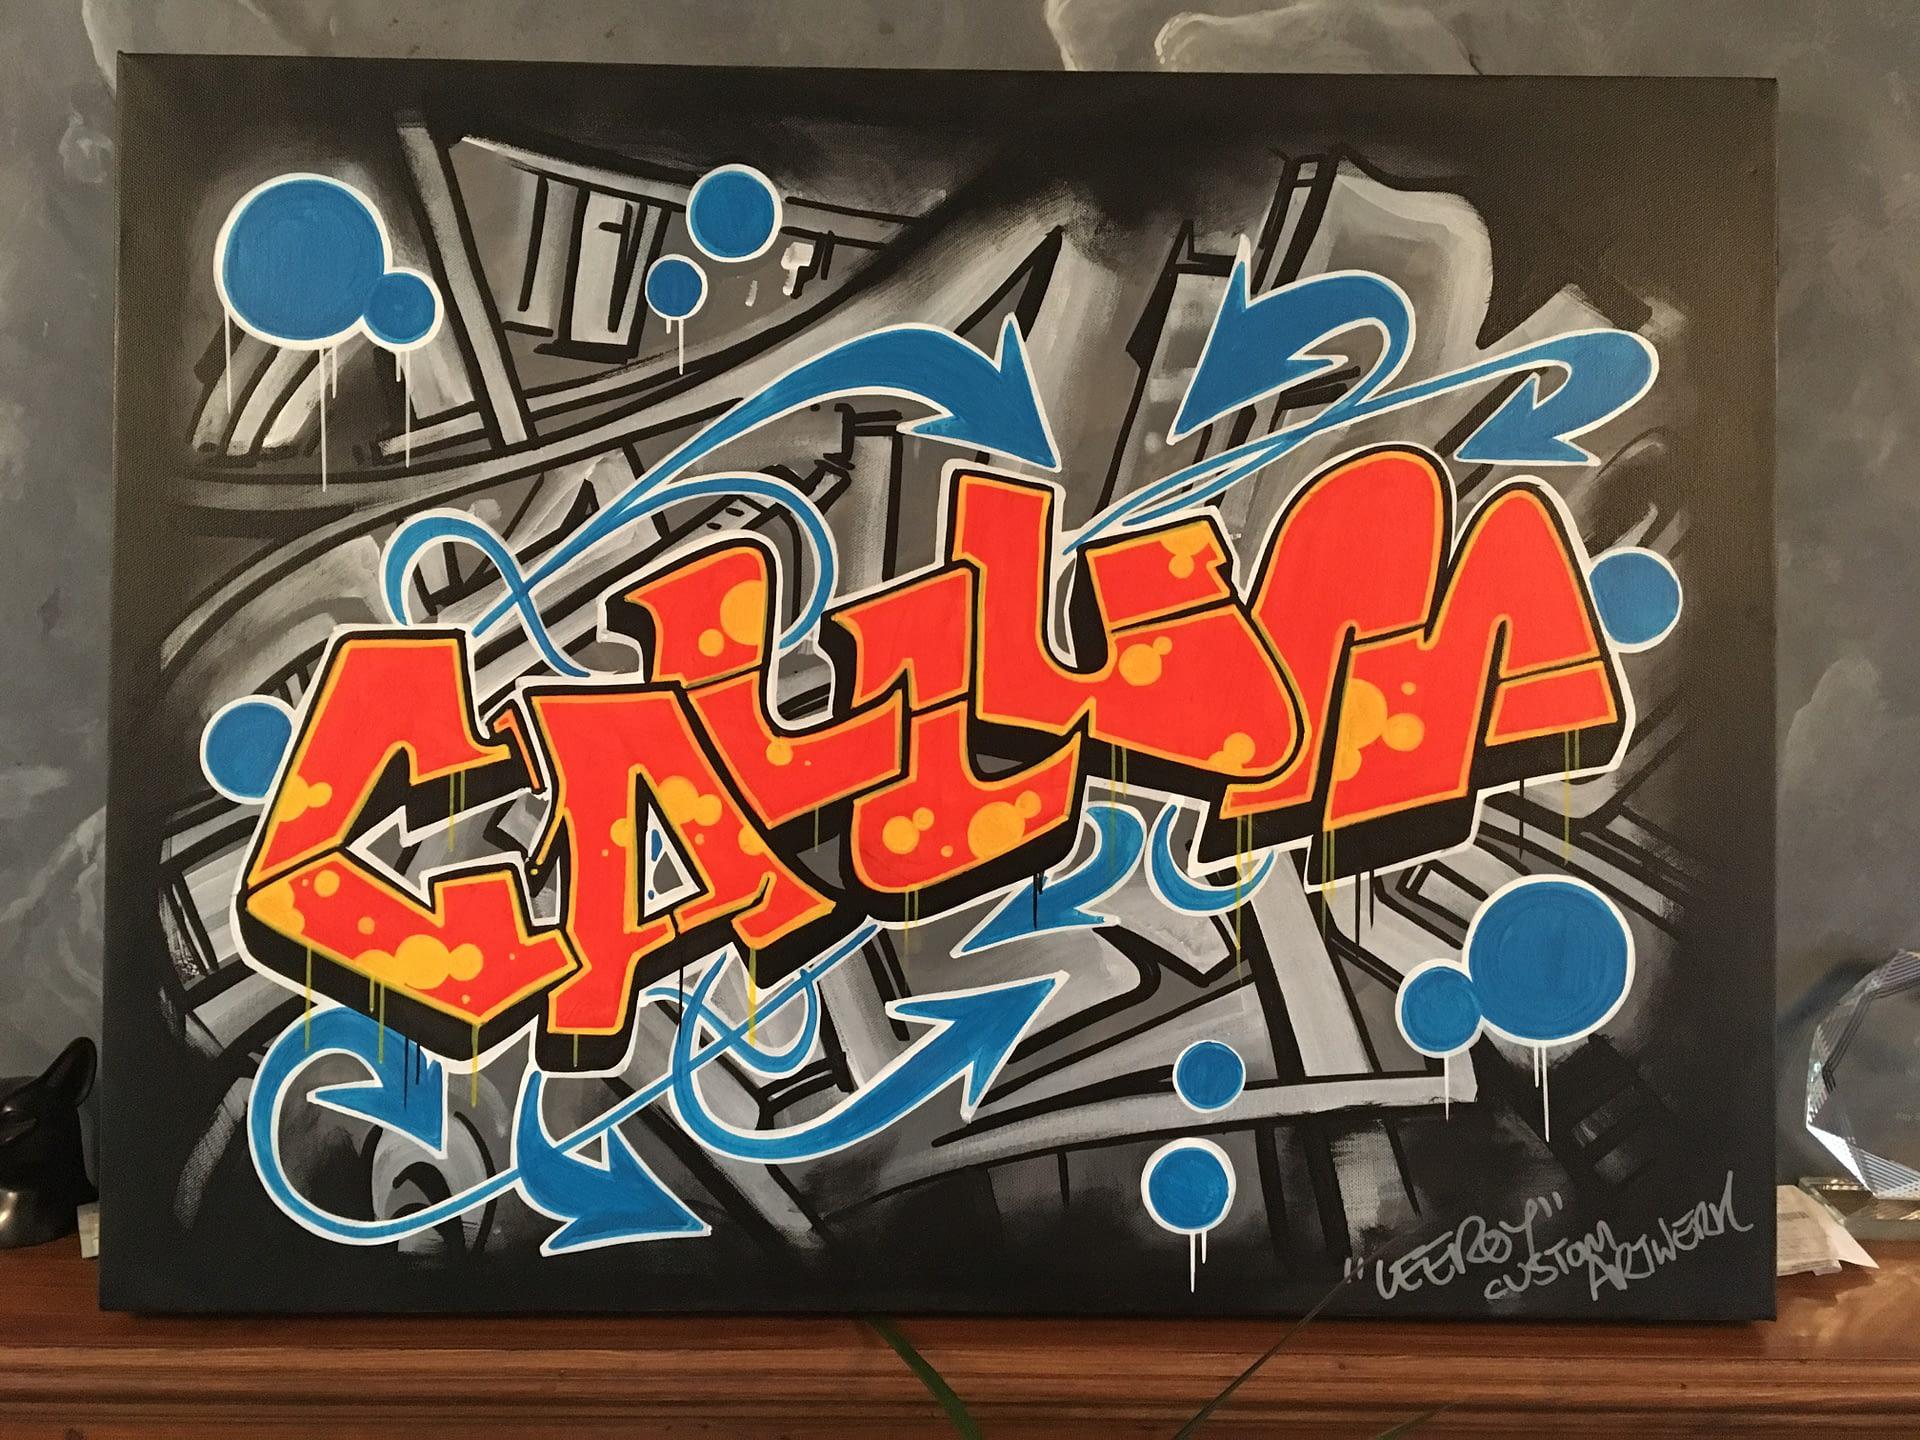 Callum Graffiti